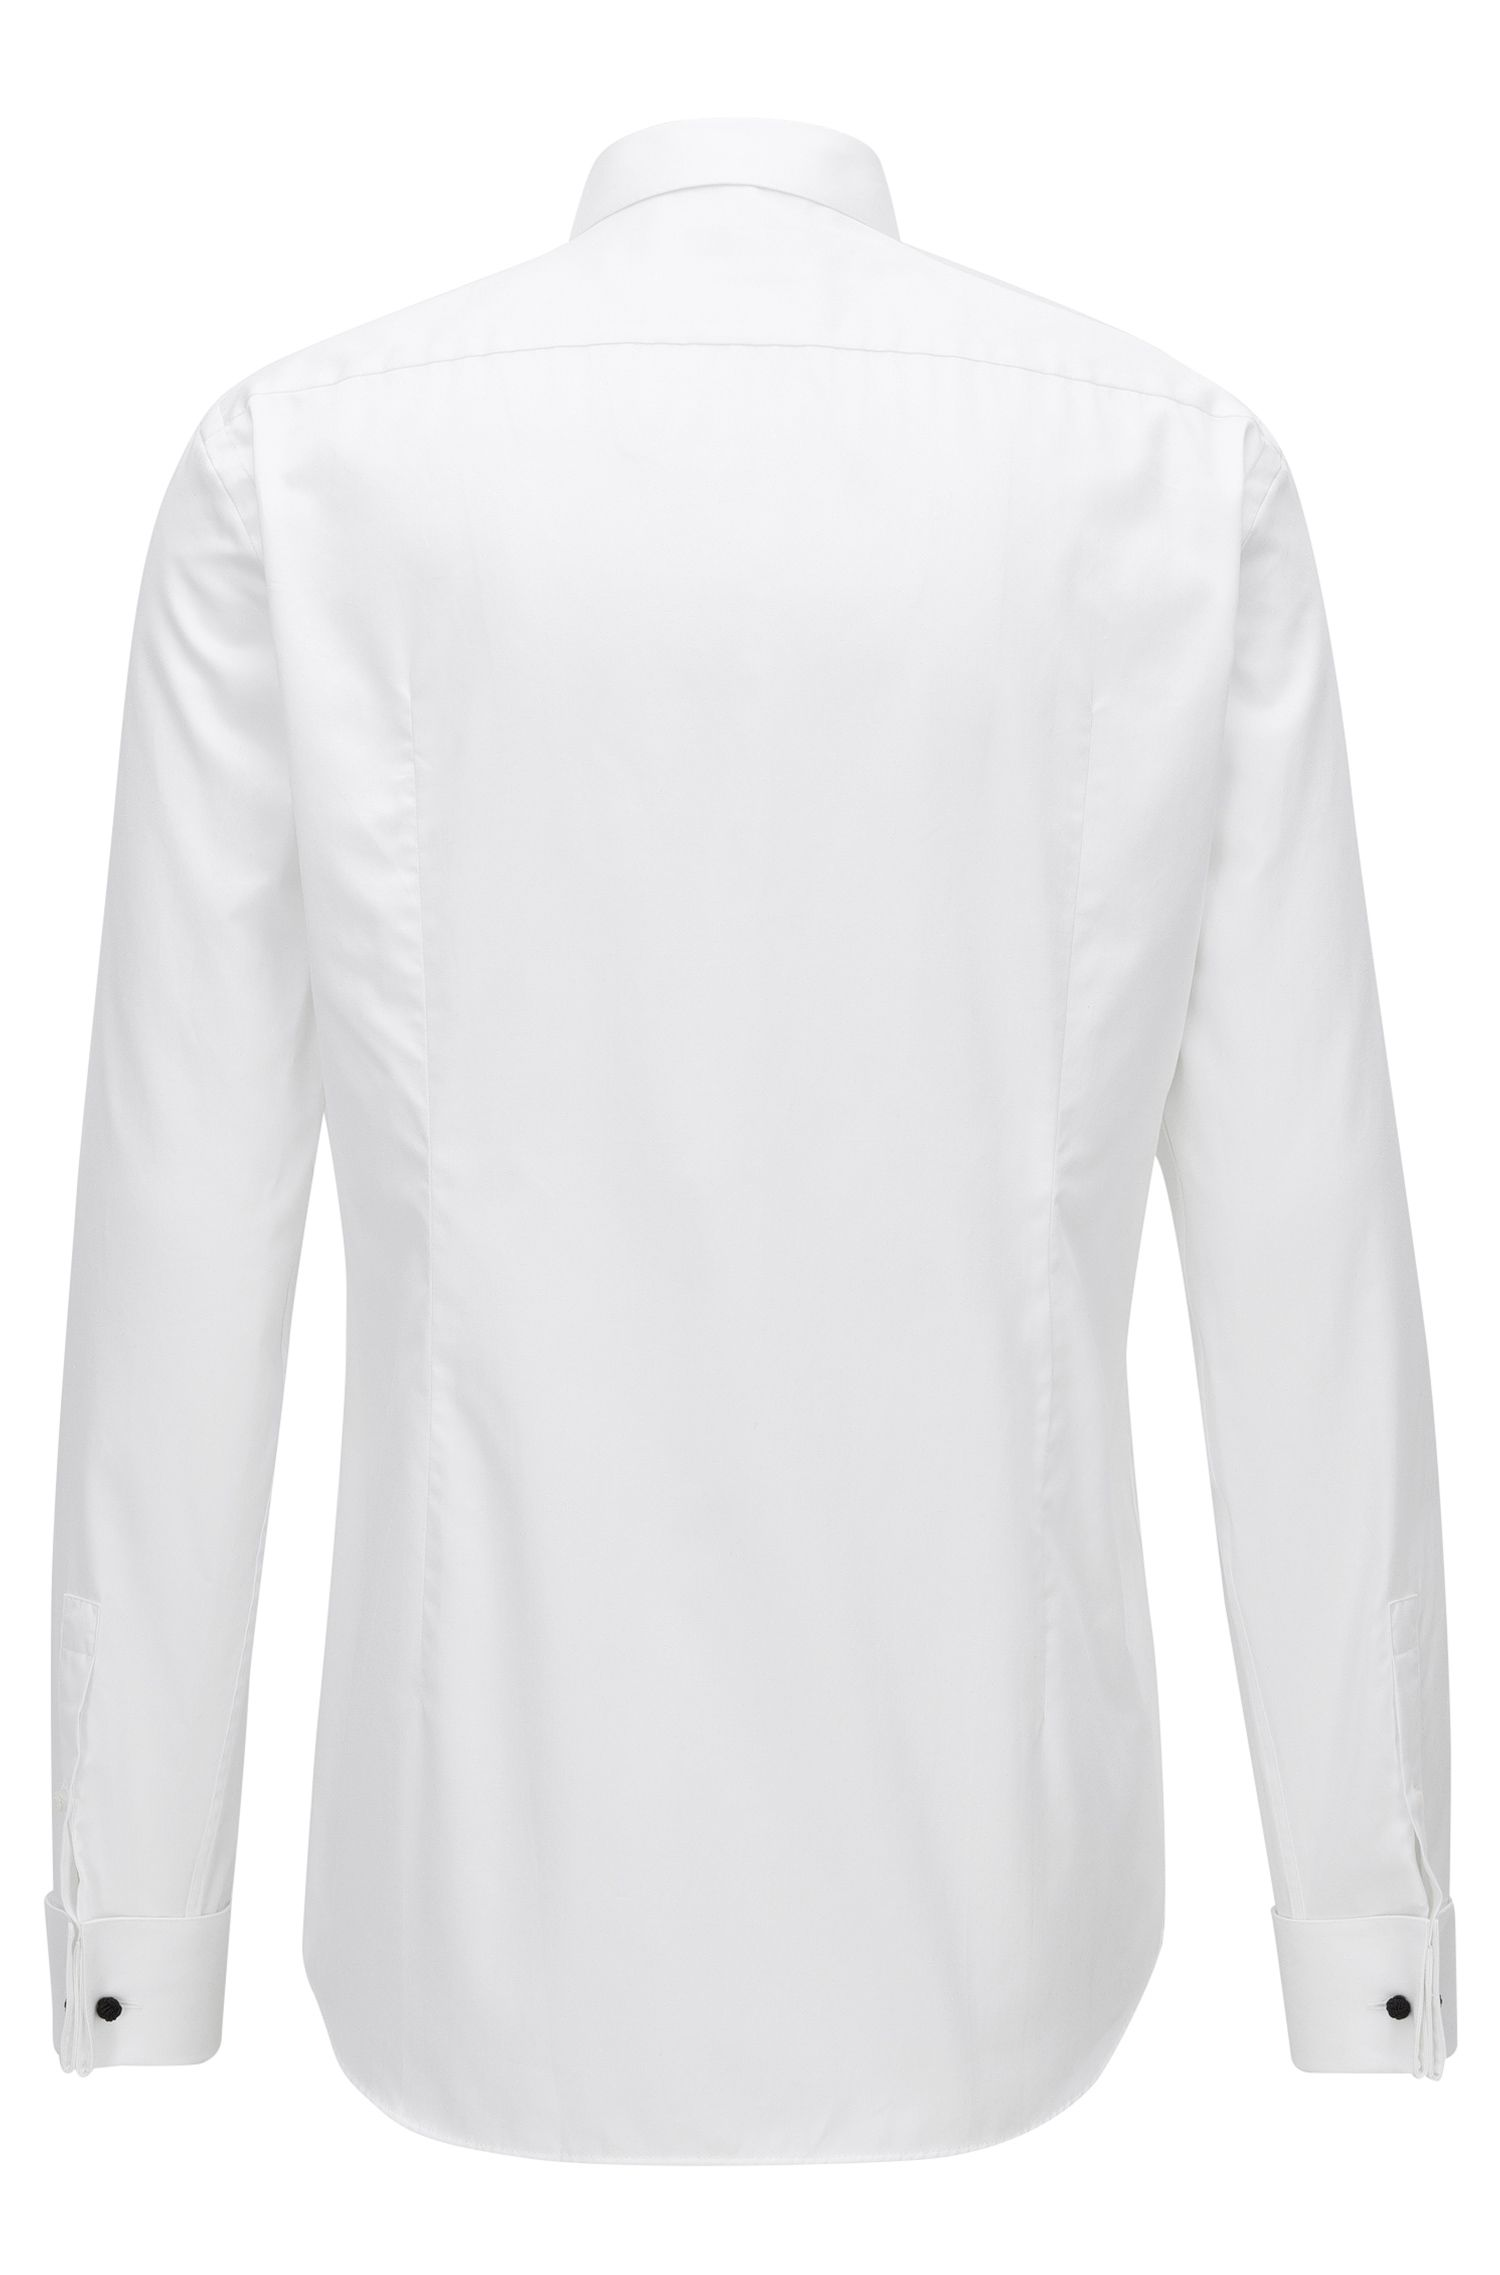 Dobby Bib Tuxedo Shirt, Slim Fit | Jarome